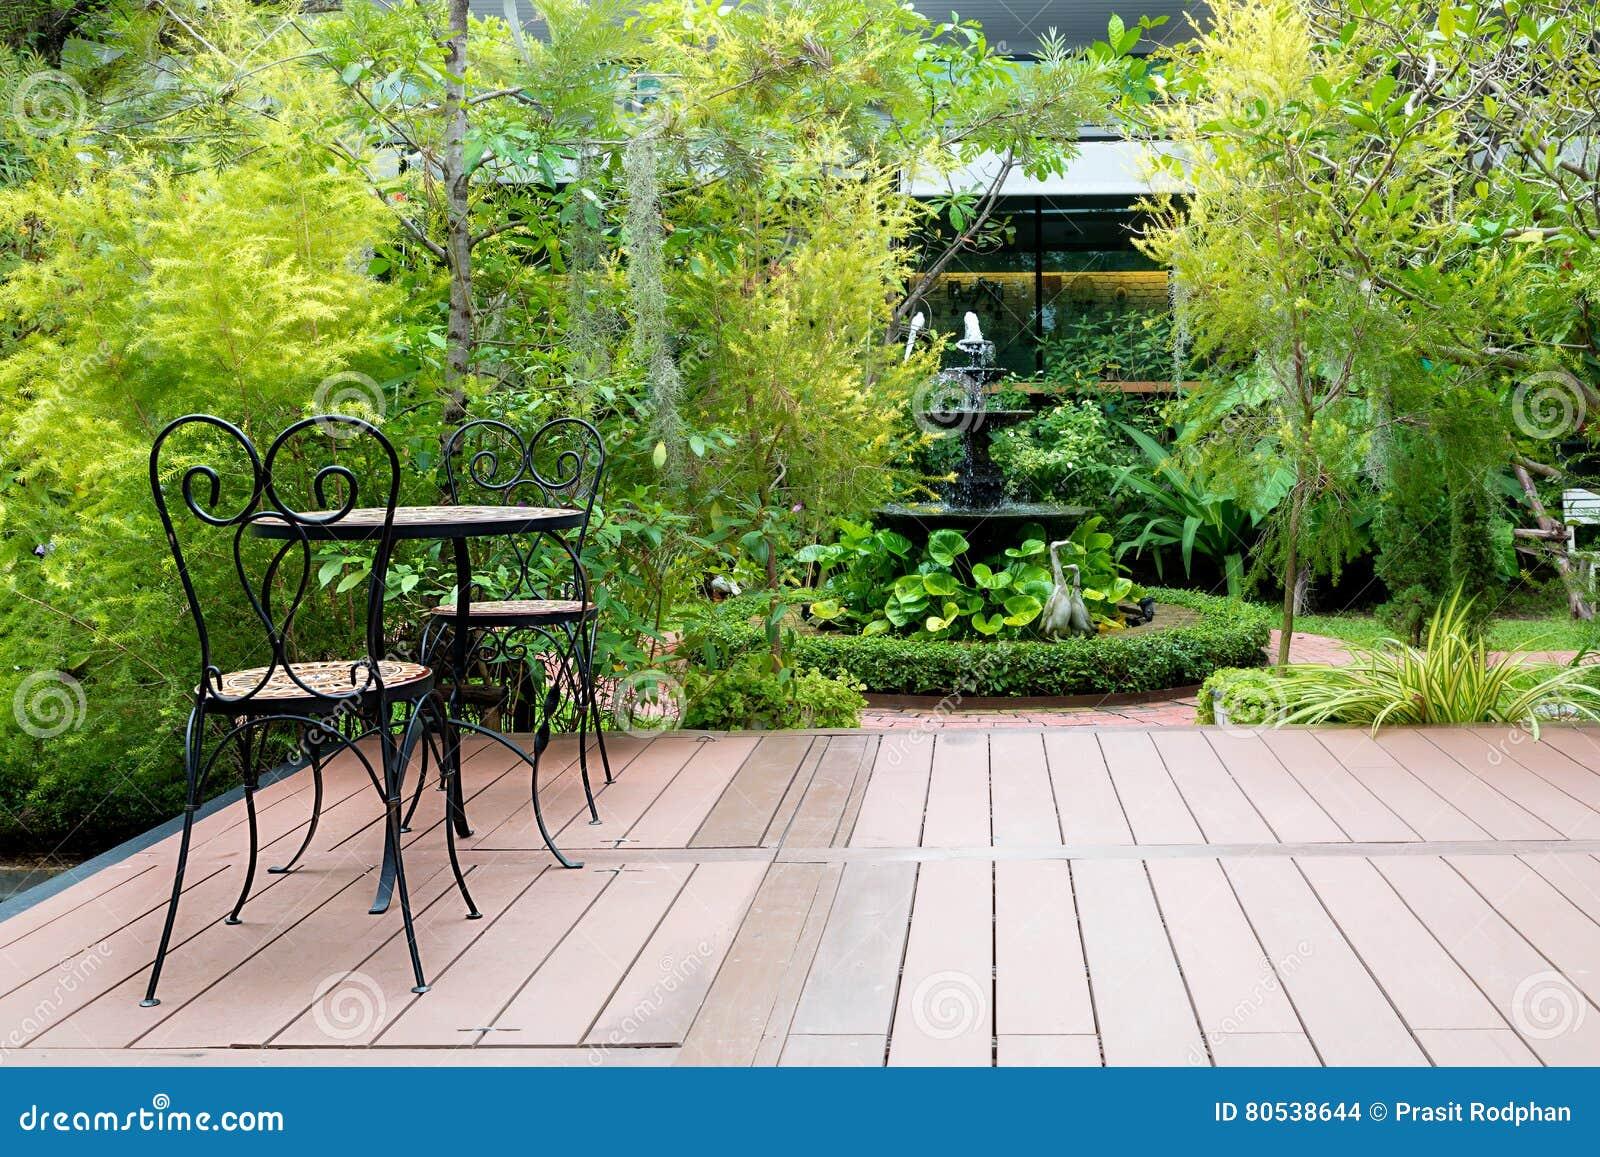 Wood chair in garden royalty free stock image - Ideas para hacer un jardin ...